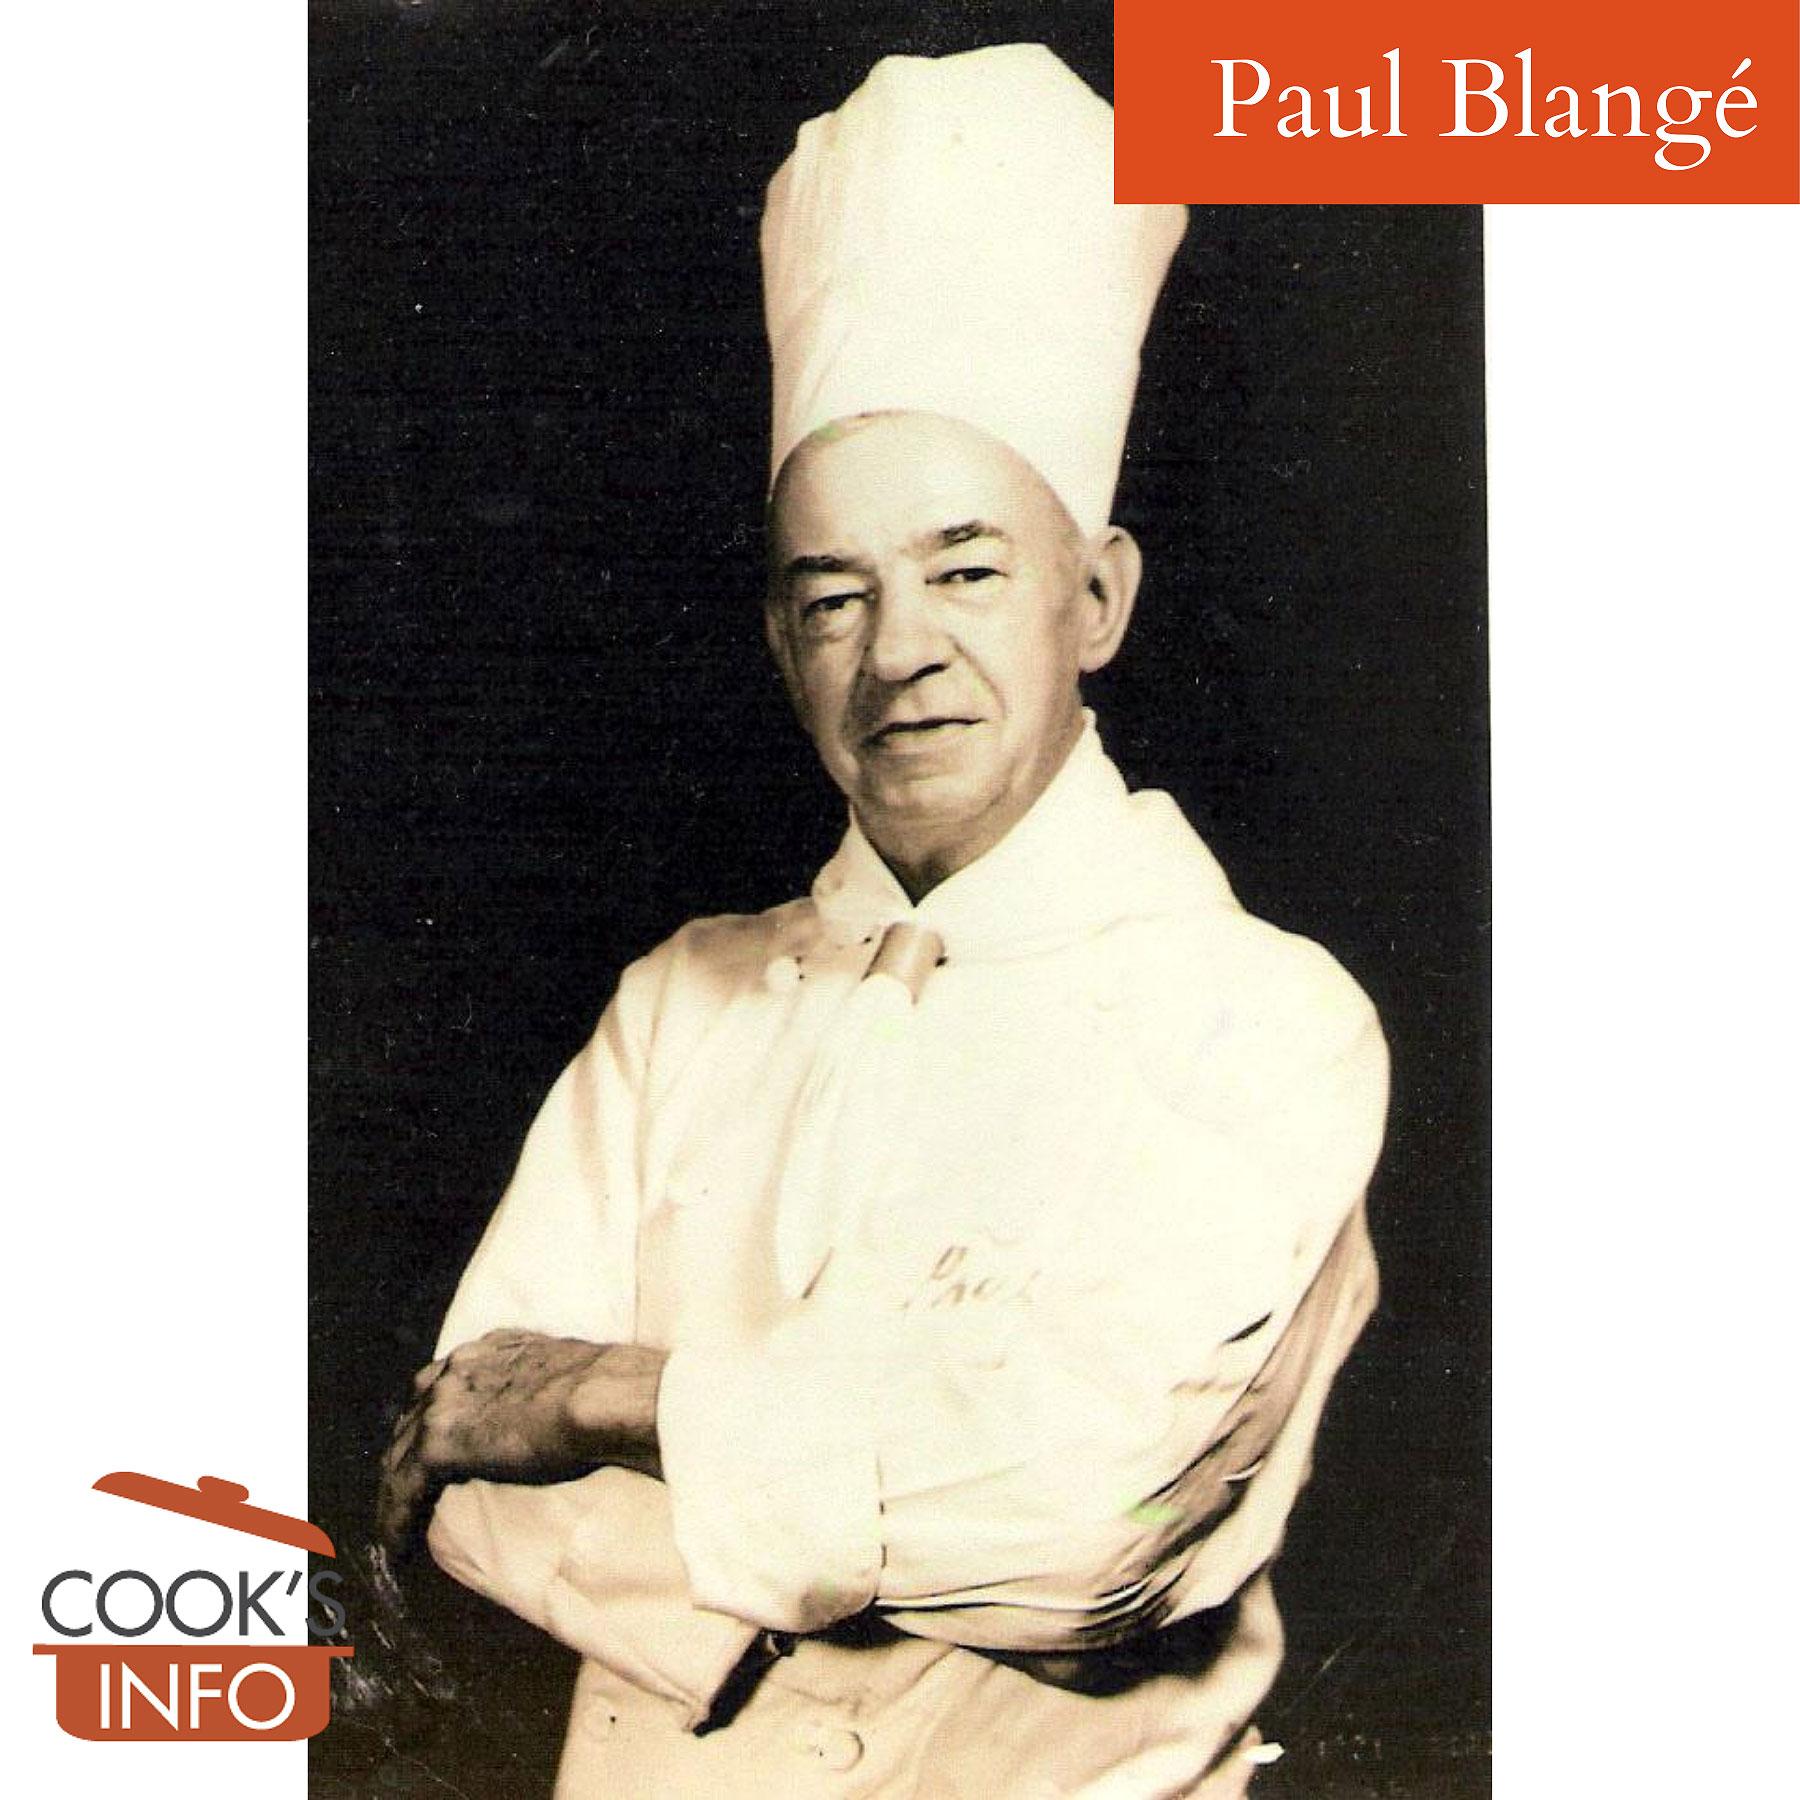 Paul Blangé